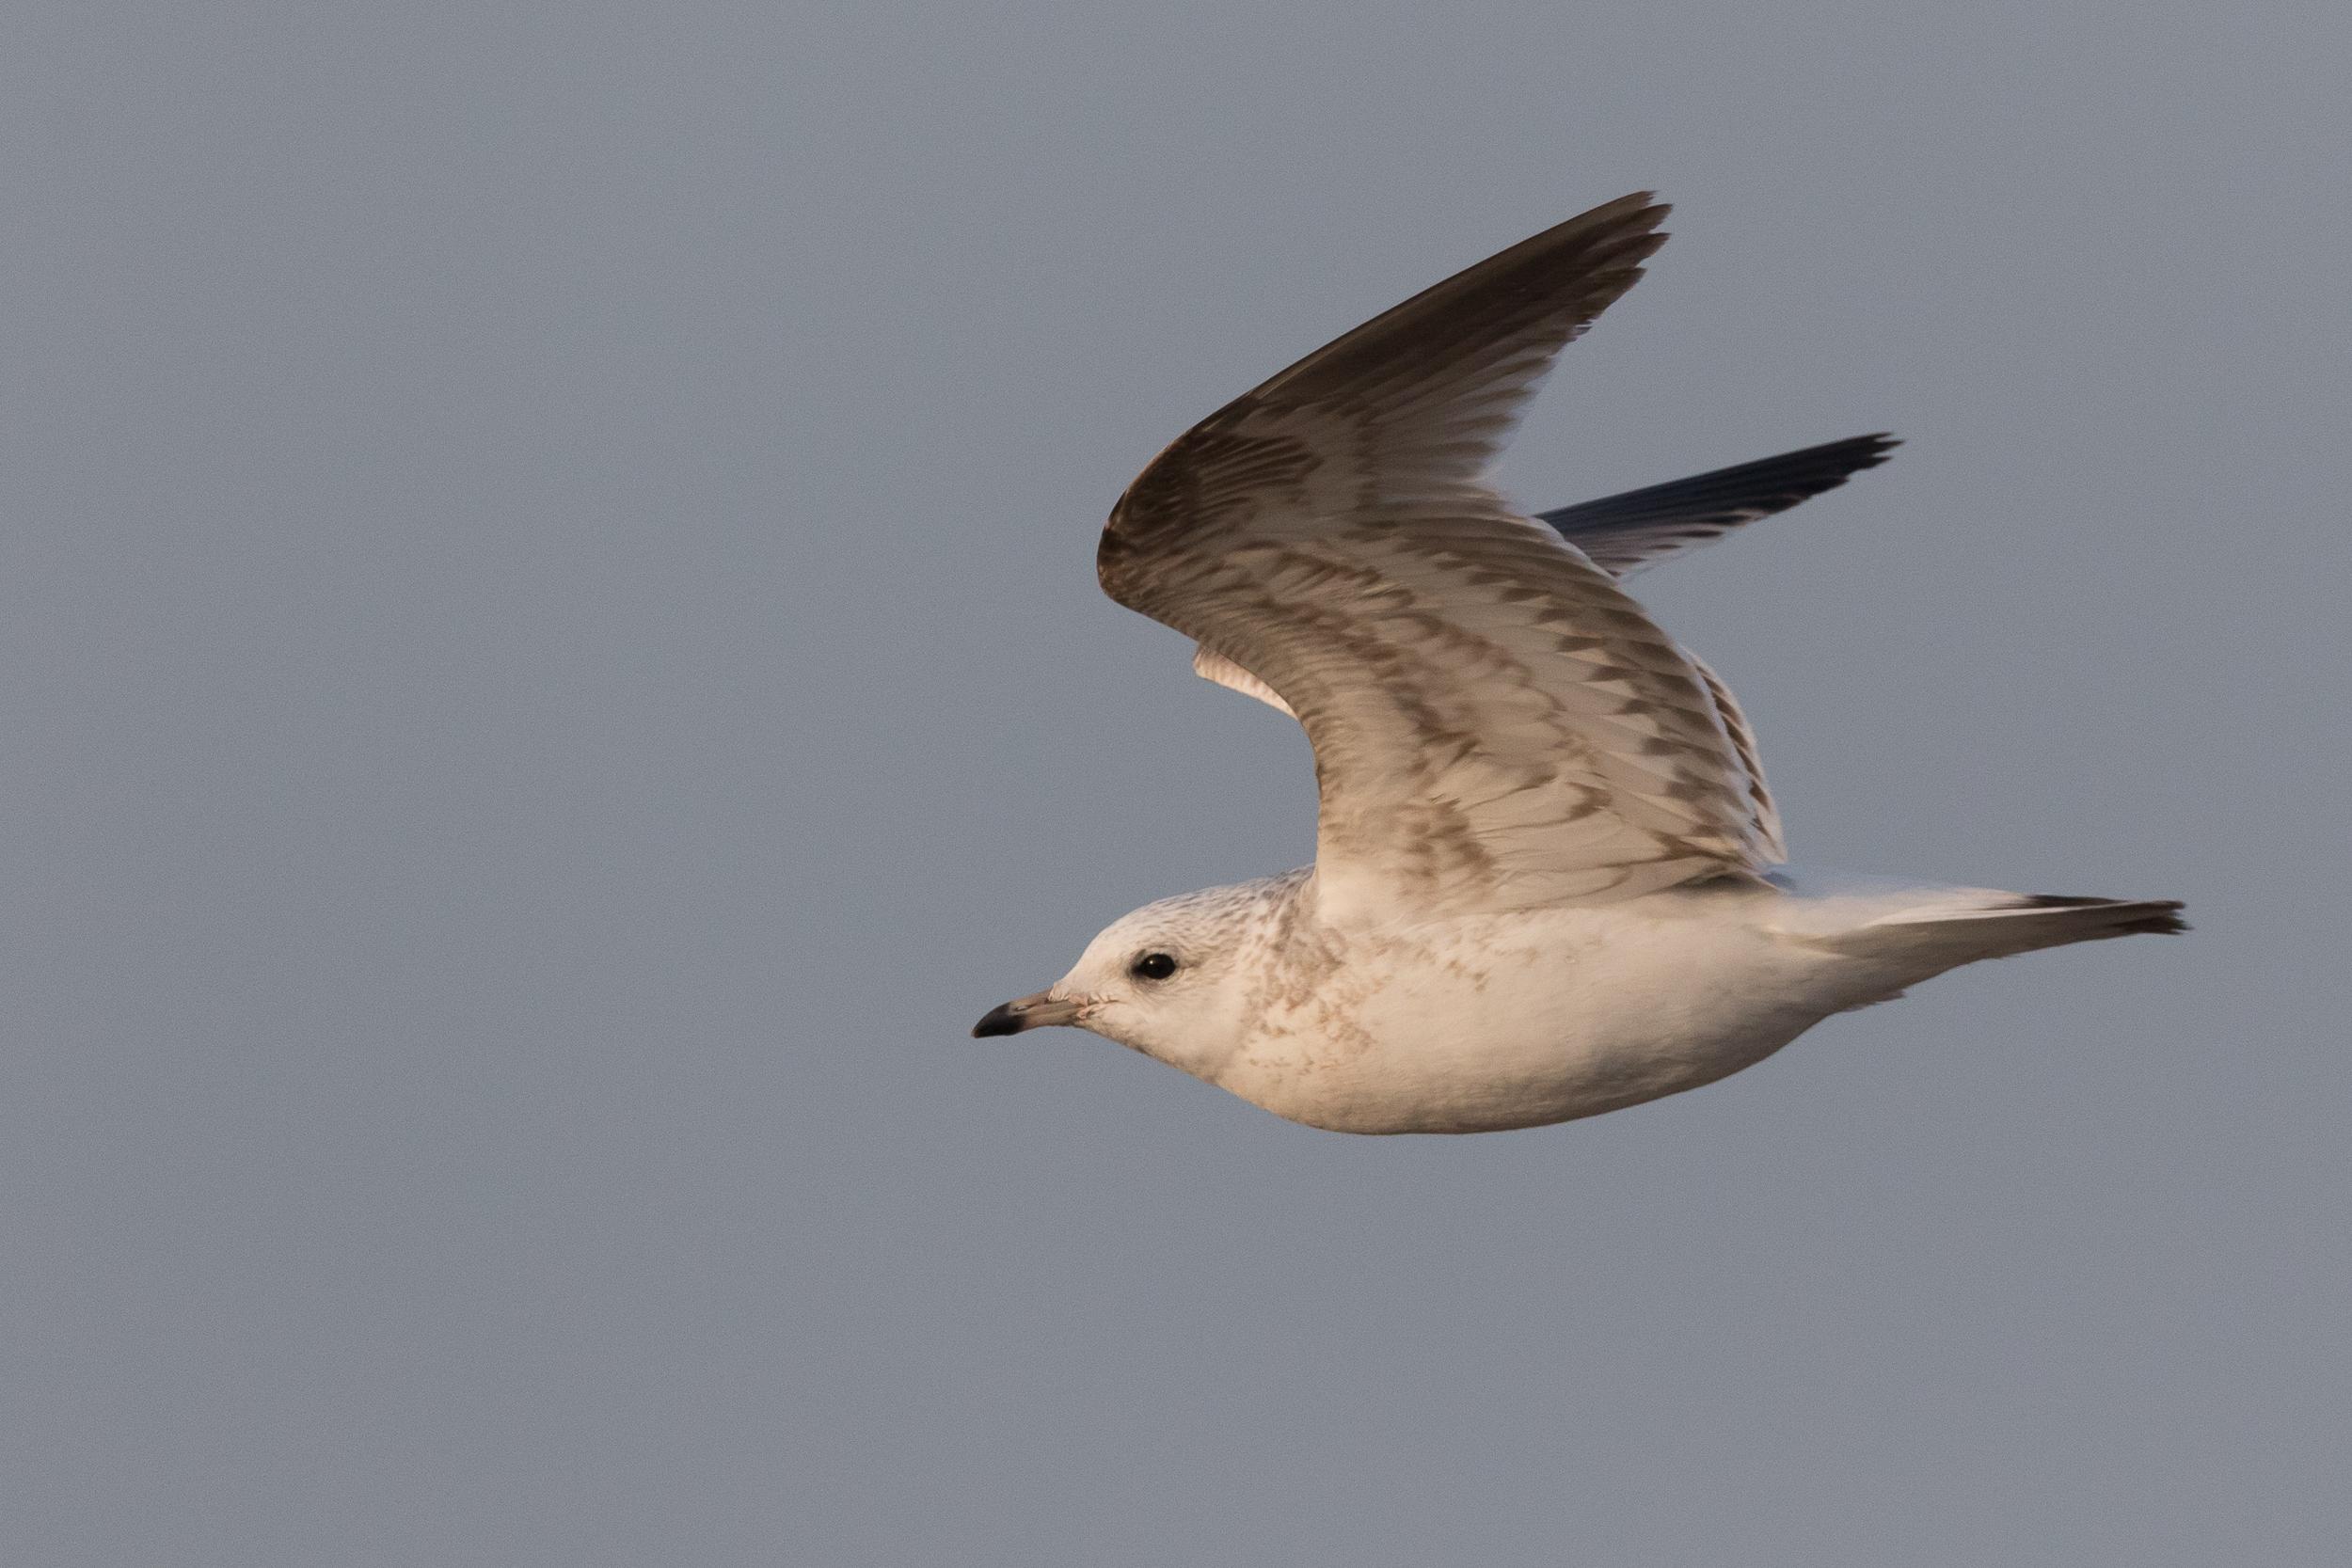 20170126-Common Gull 2CY-35.jpg